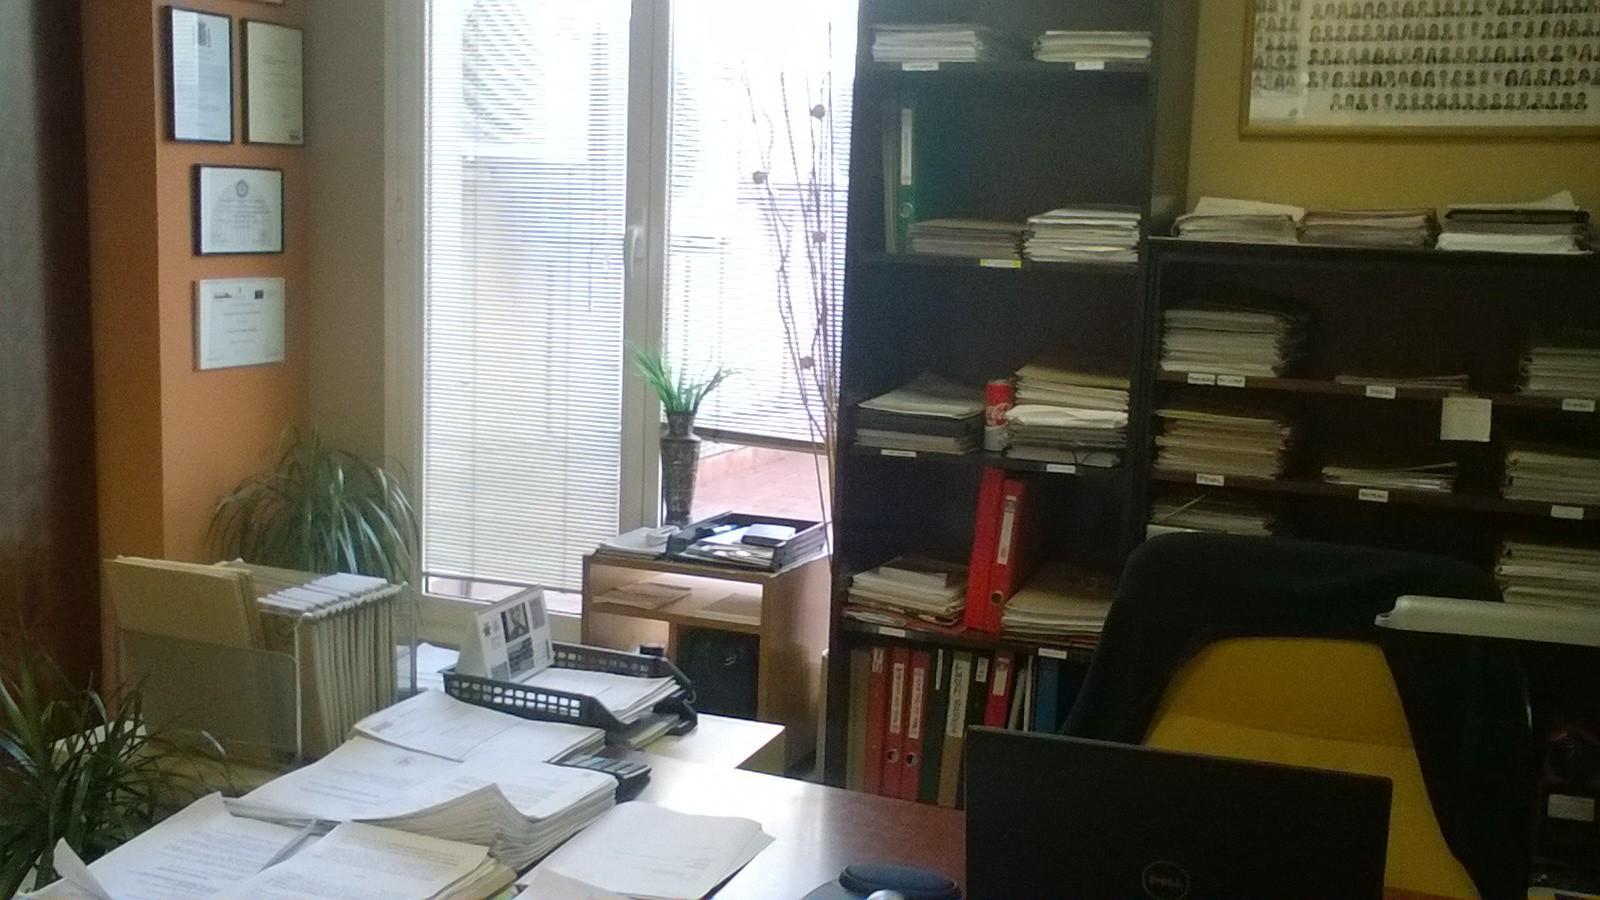 JMZ ADVOCAT: Despacho en Sabadell